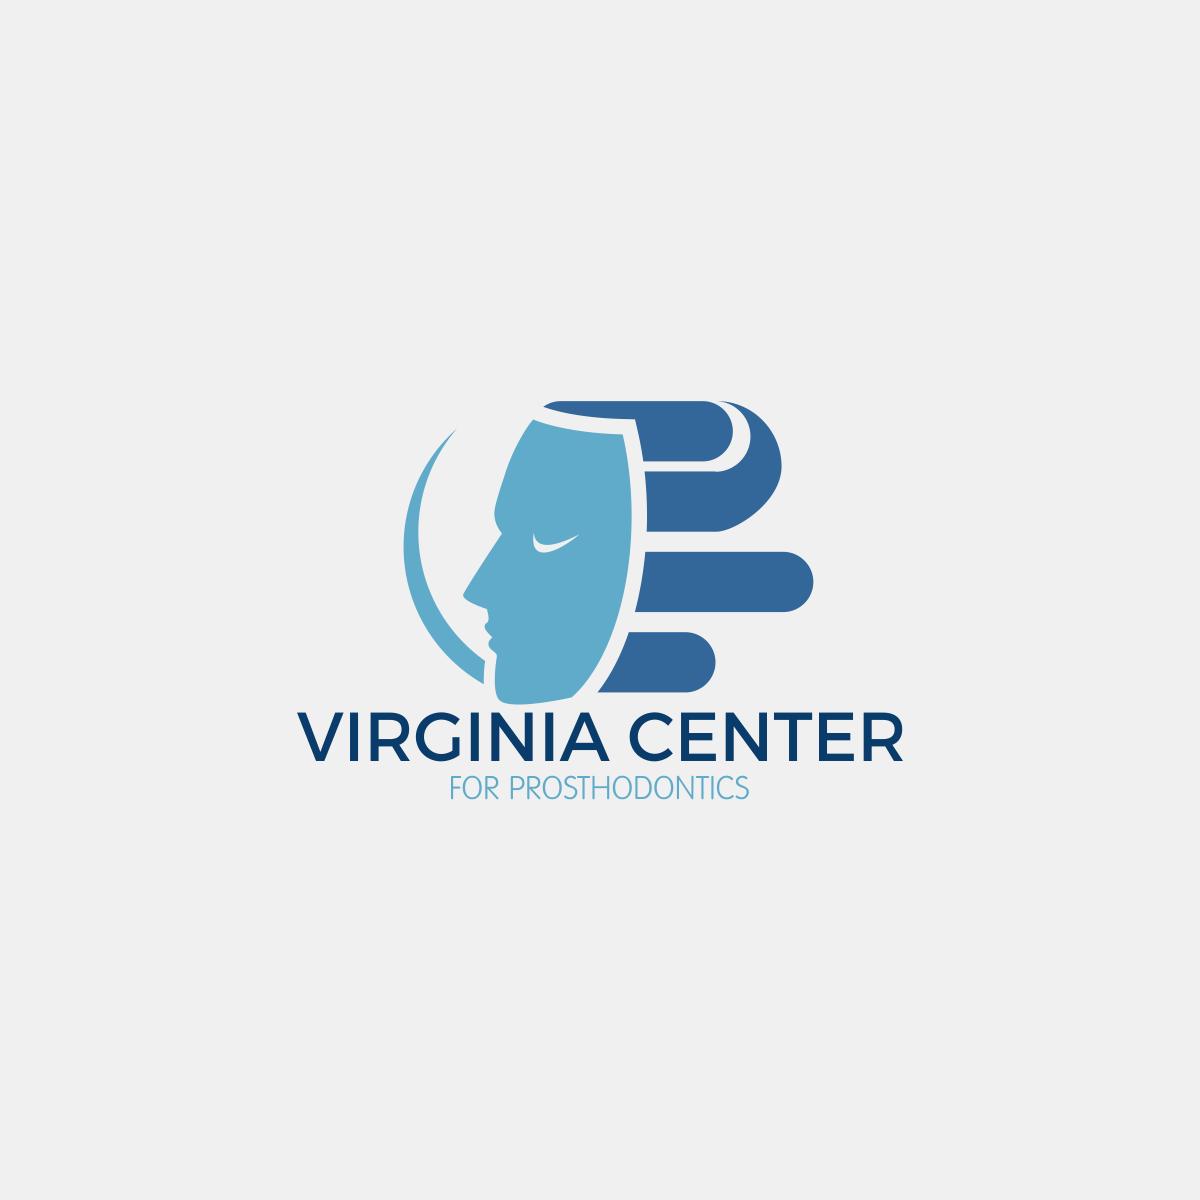 Logo Design by Private User - Entry No. 30 in the Logo Design Contest Imaginative Logo Design for Virginia Center for Prosthodontics.